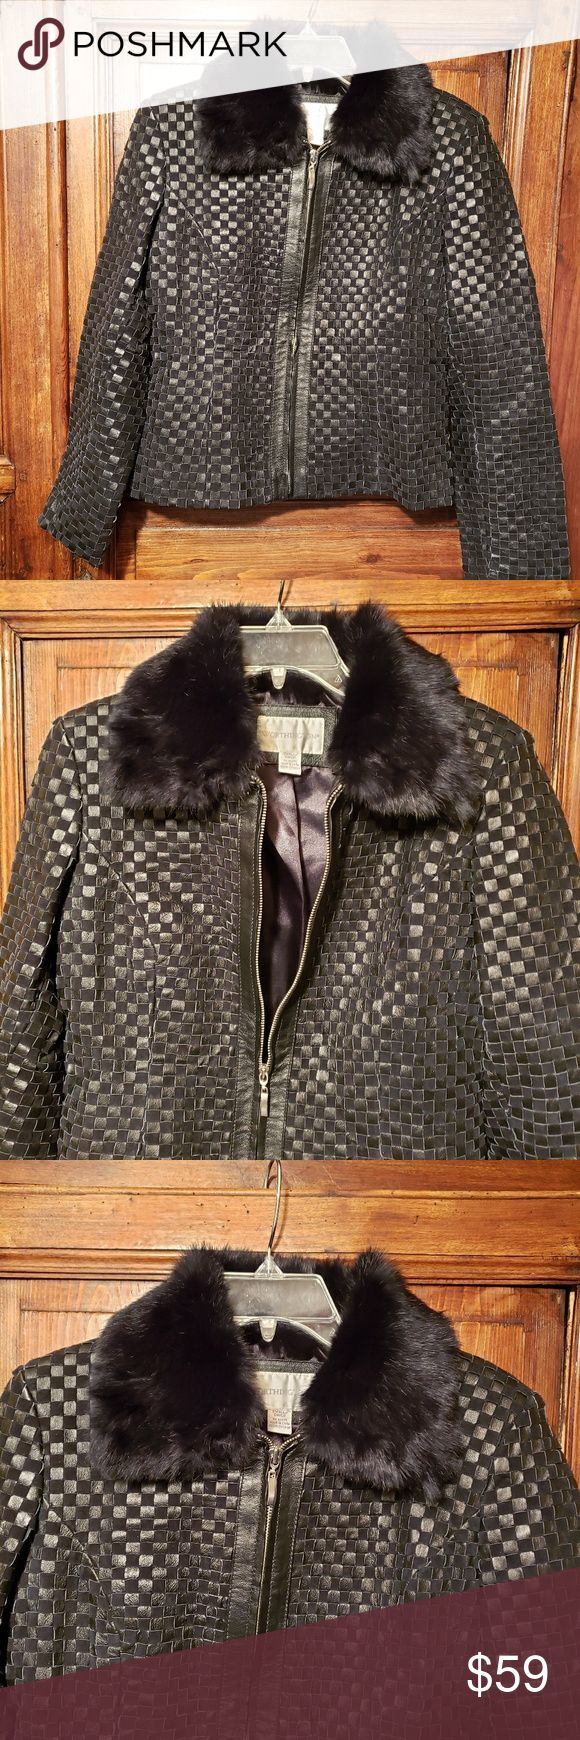 Worthington Woven Leather Jacket Fur Collar sz S Fur